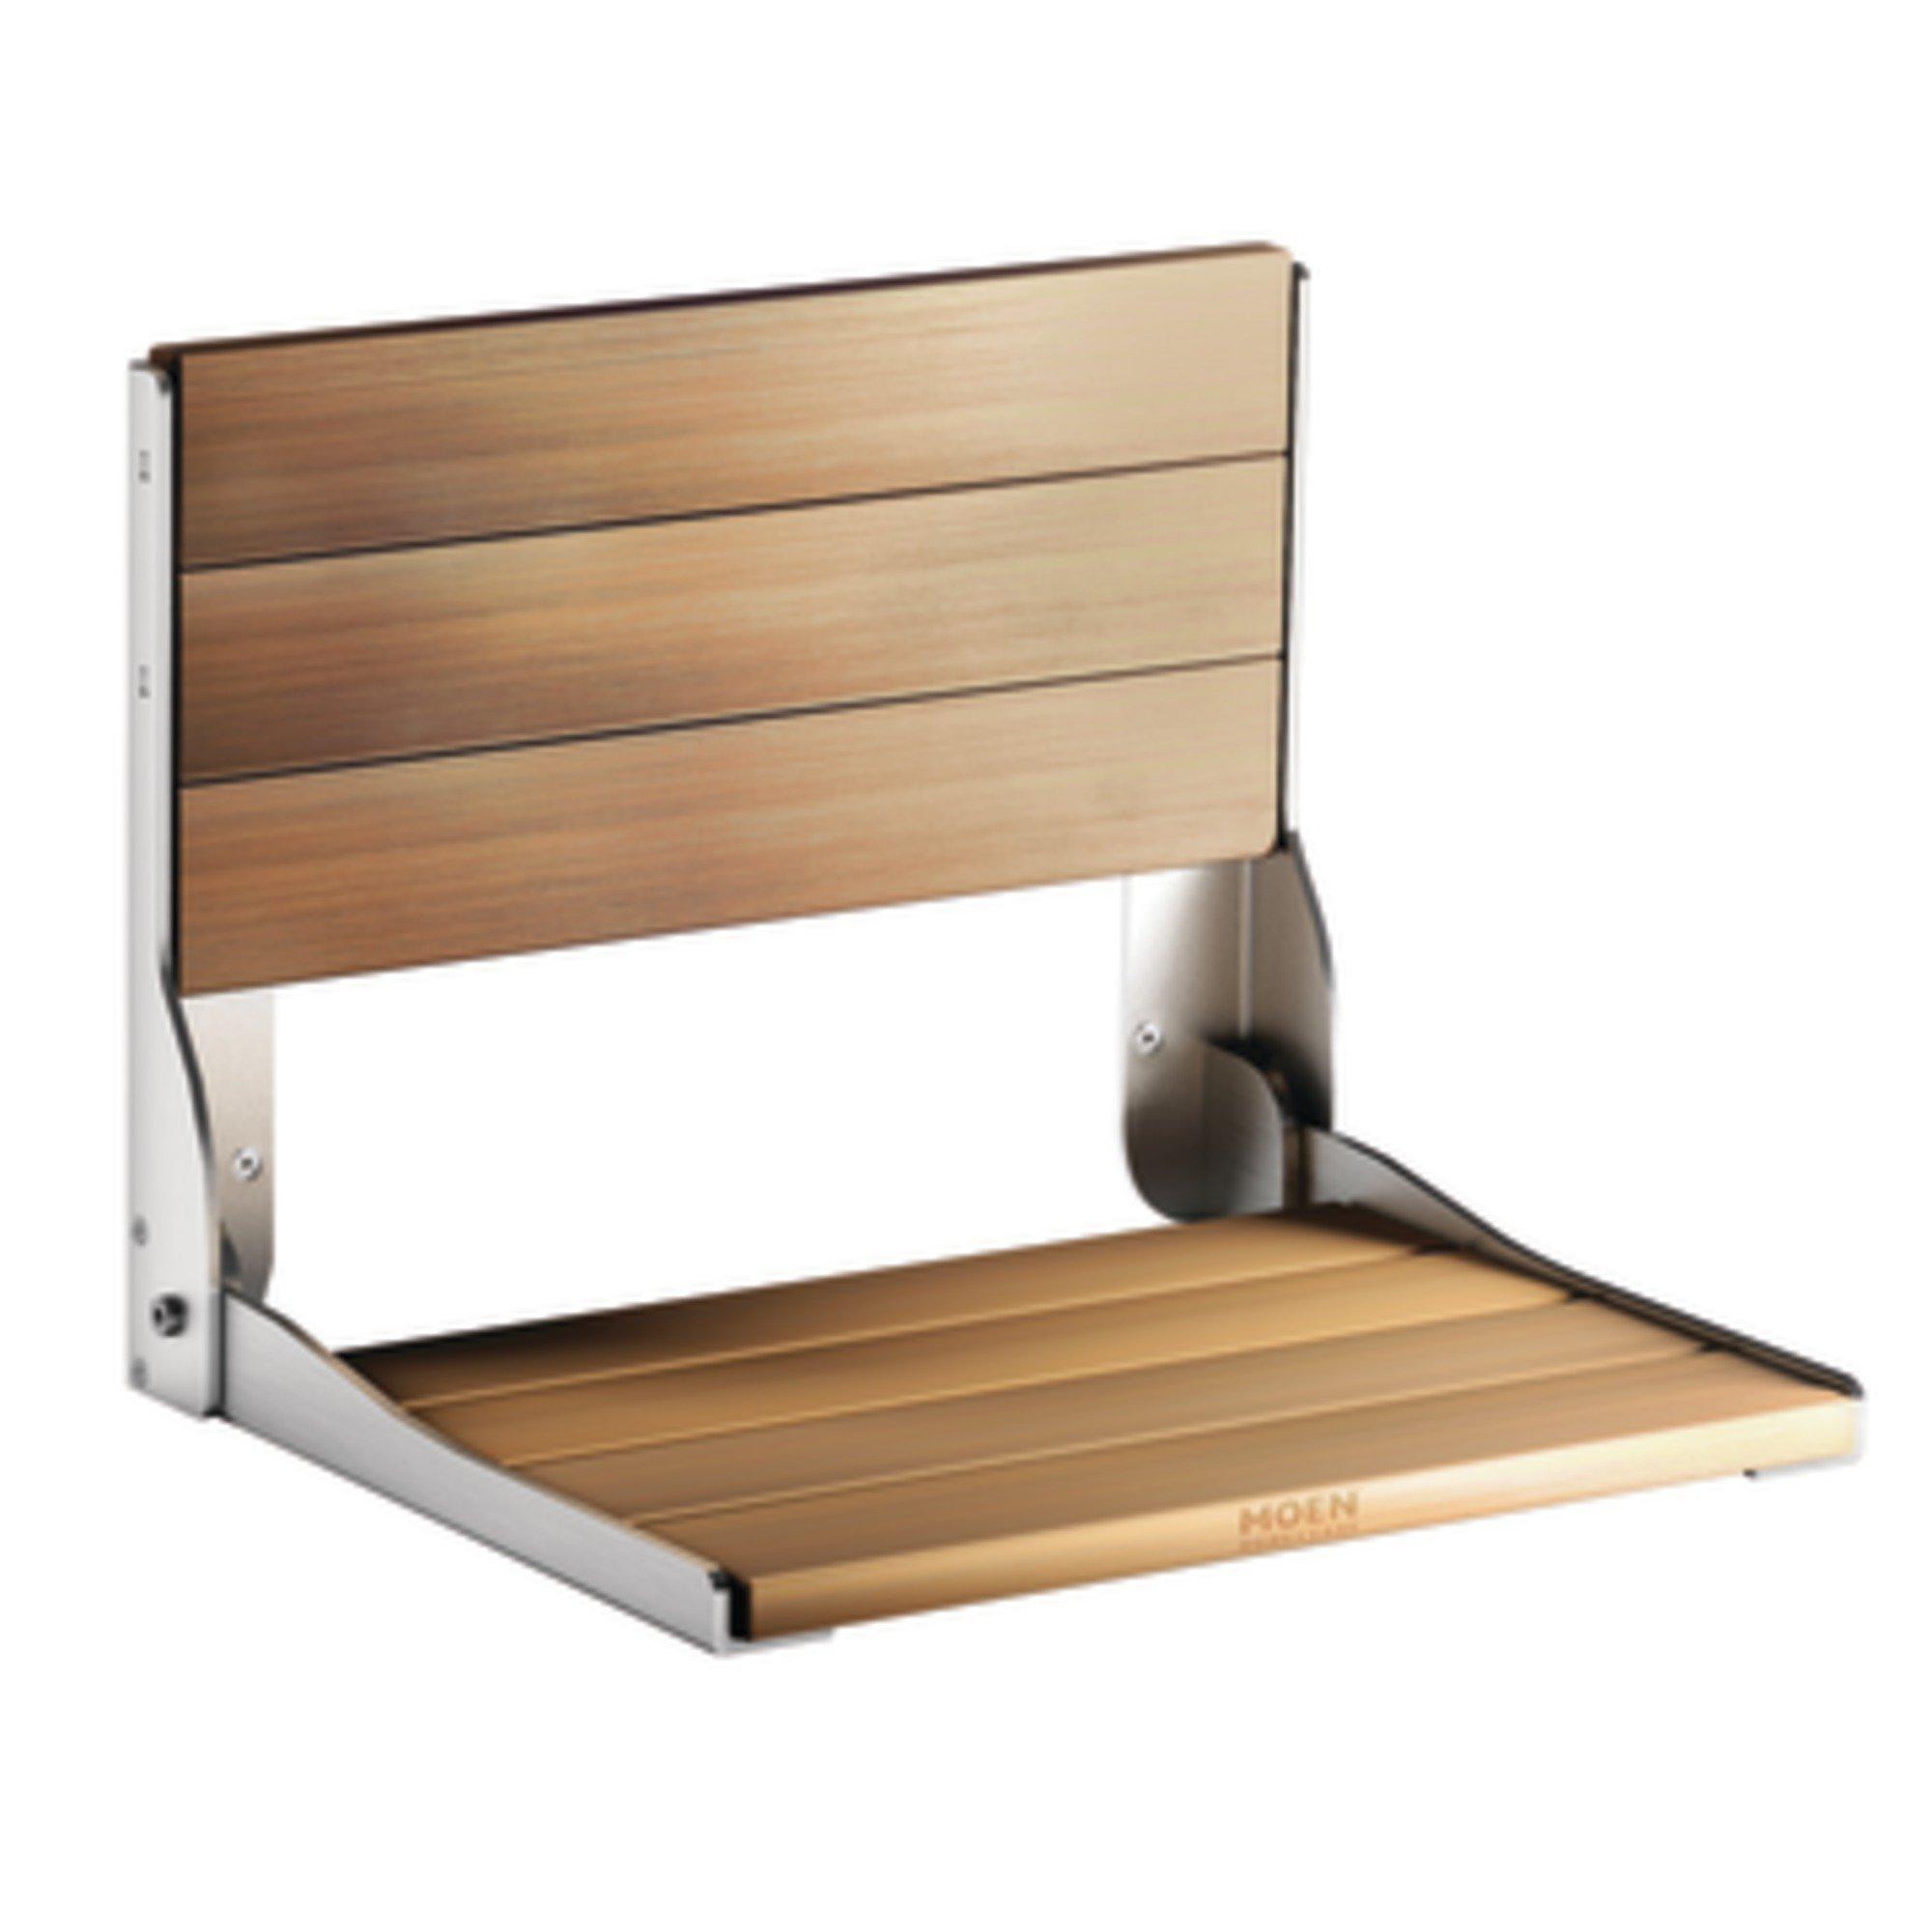 Moen Teak Wood Folding Shower Seat, Aluminum (DN7110)